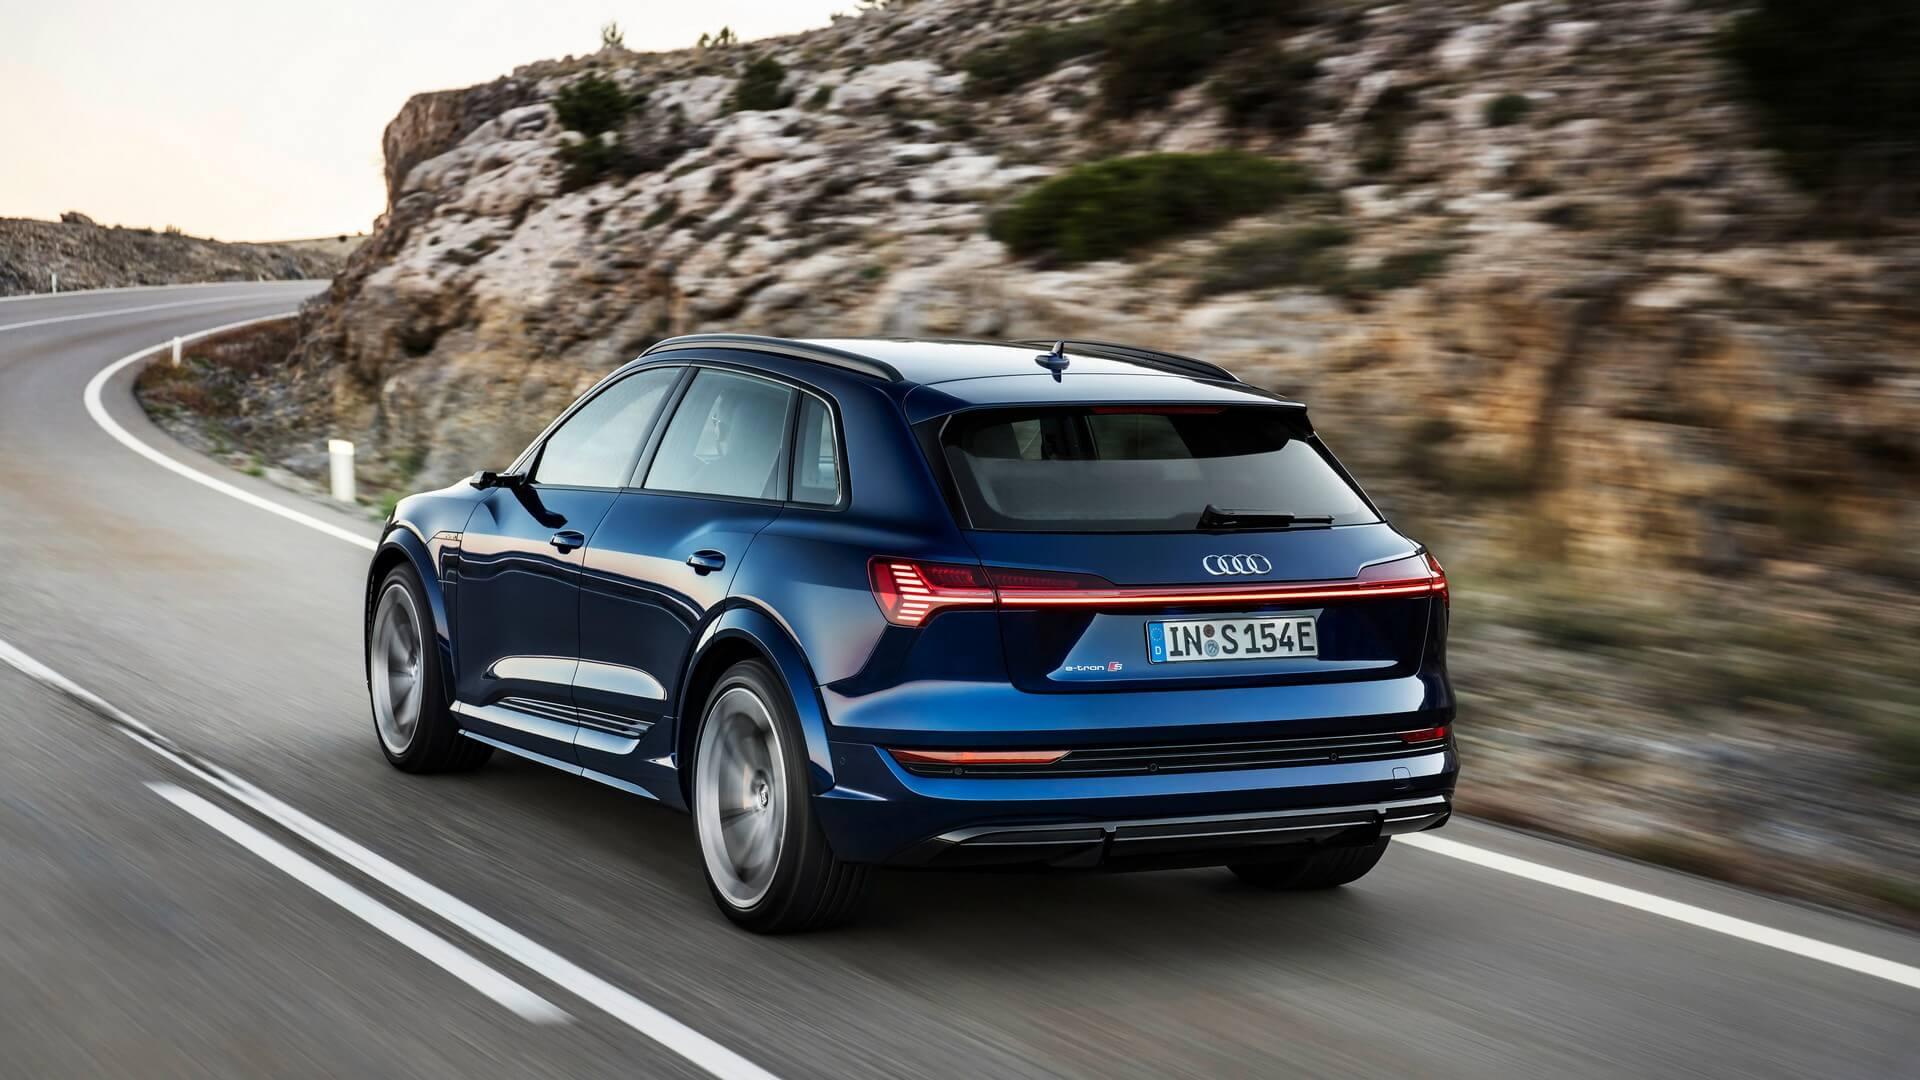 Audi-E-Tron-S-and-E-Tron-S-Sportback-2020-17